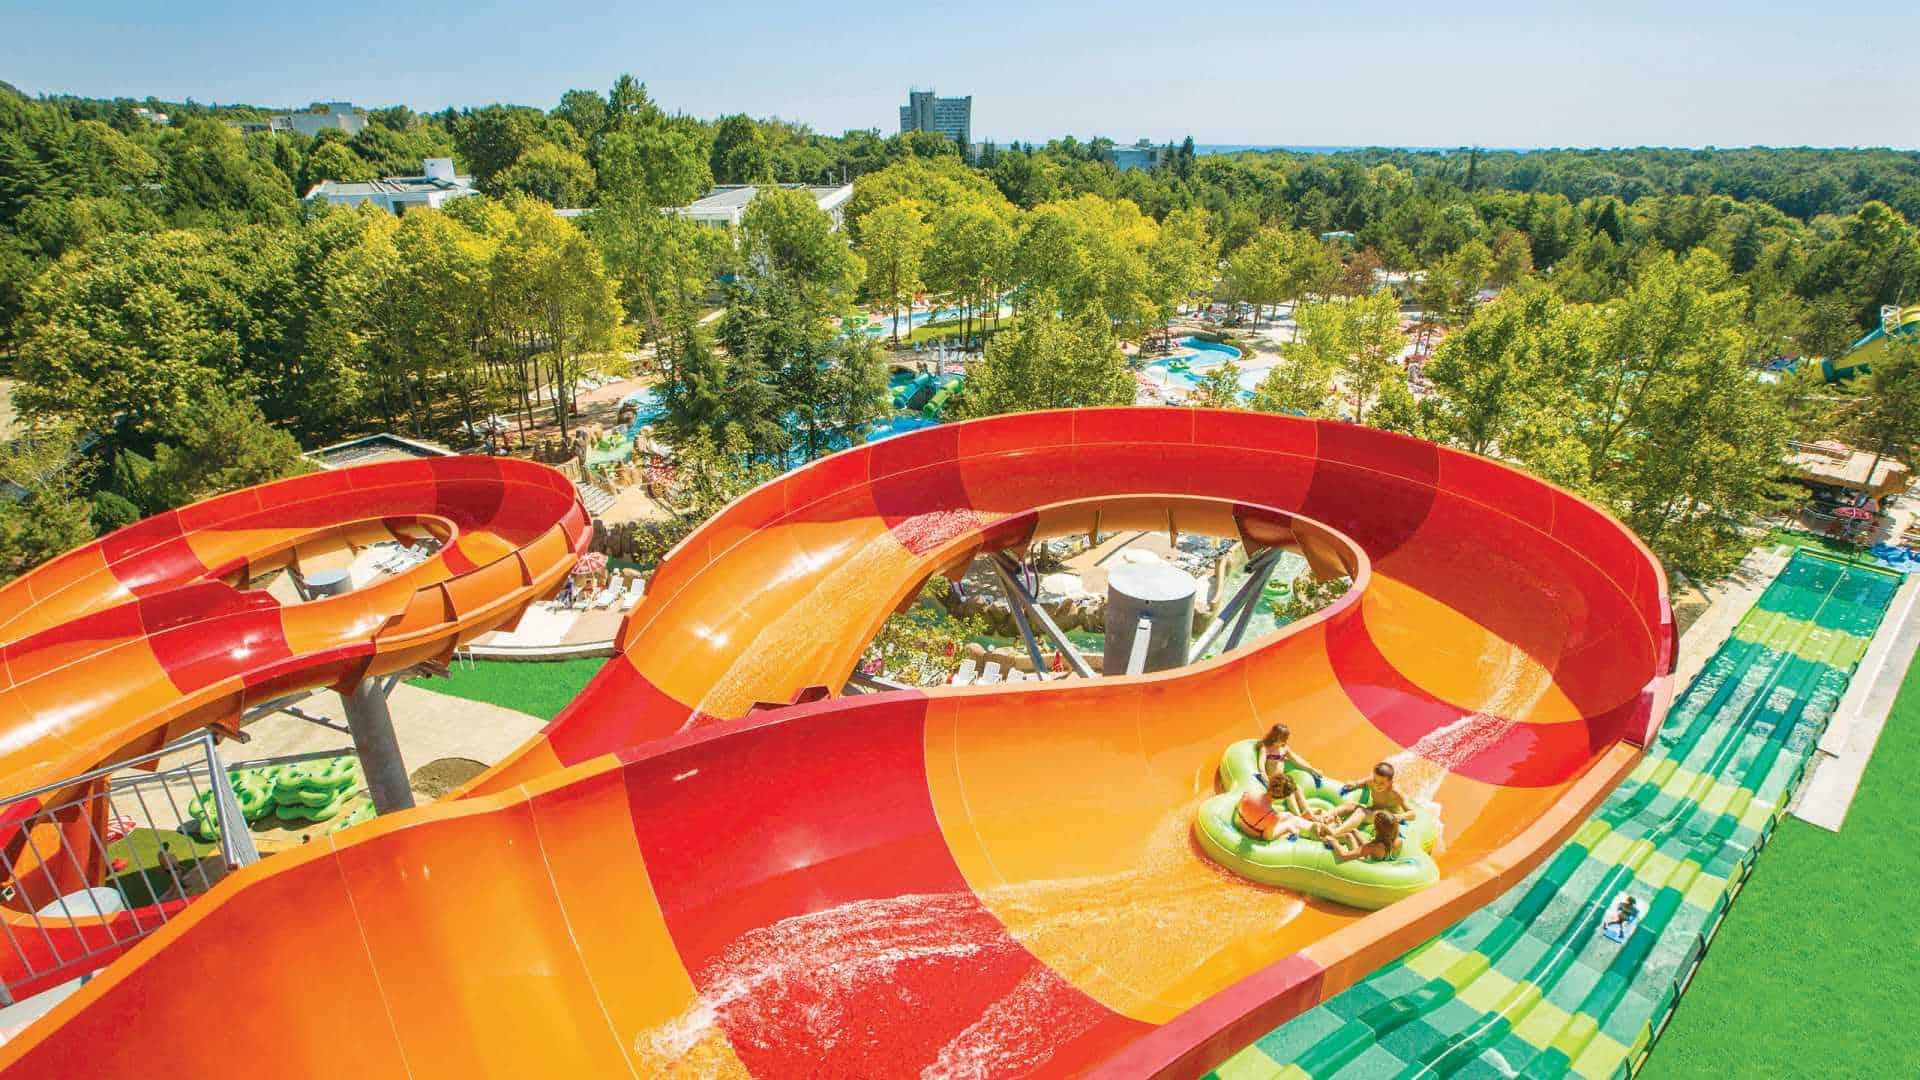 Wasserparks Aquamania